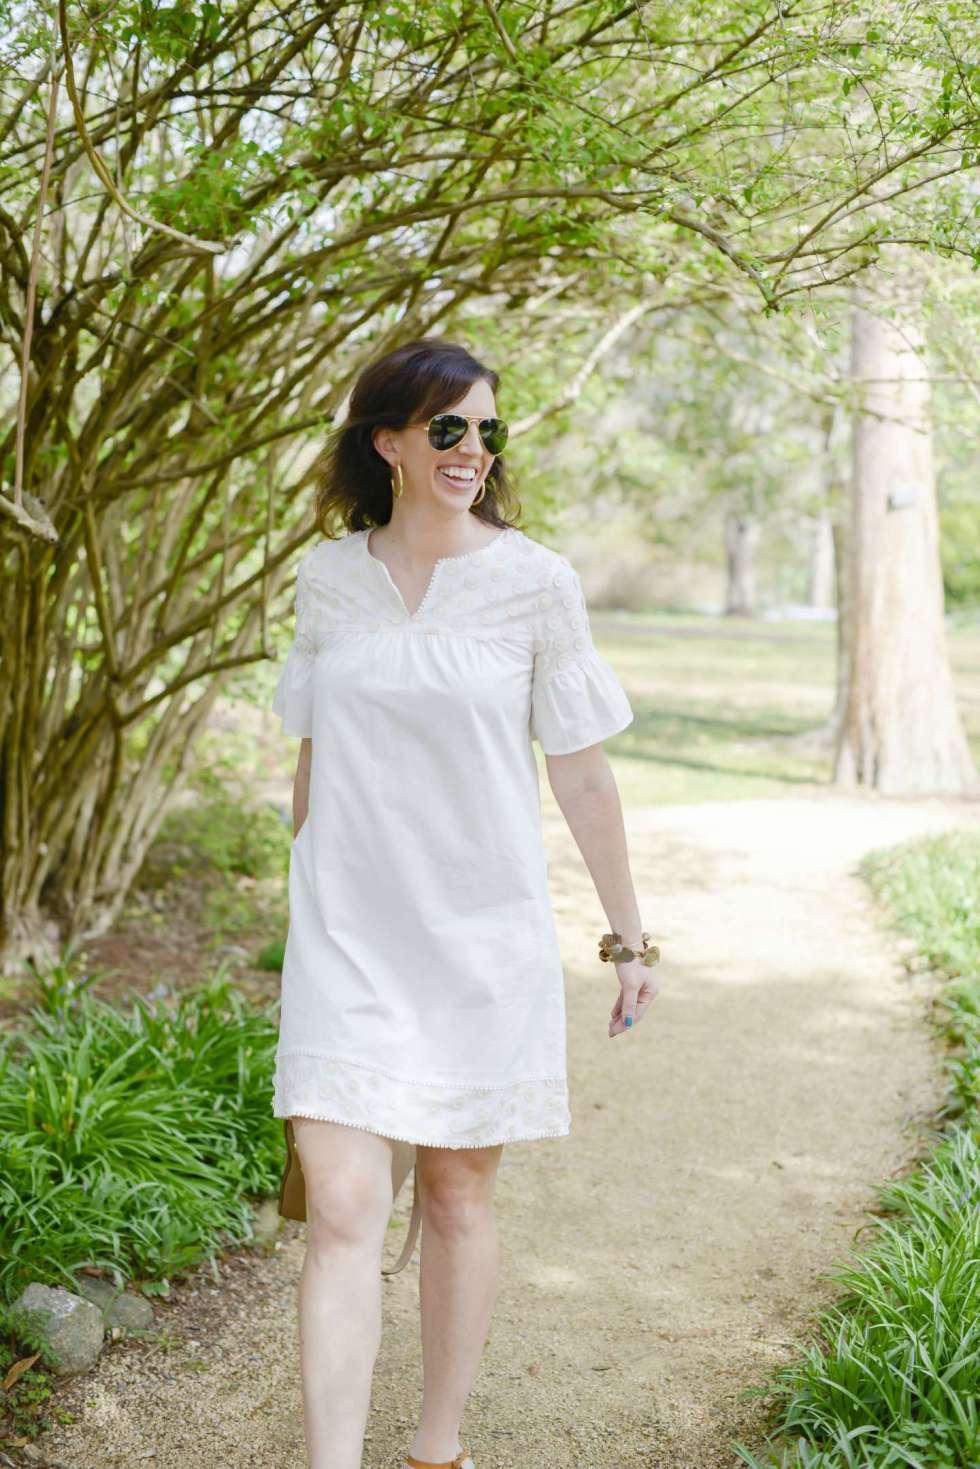 My Favorite Little White Dress for Spring - I'm Fixin' To - @mbg0112